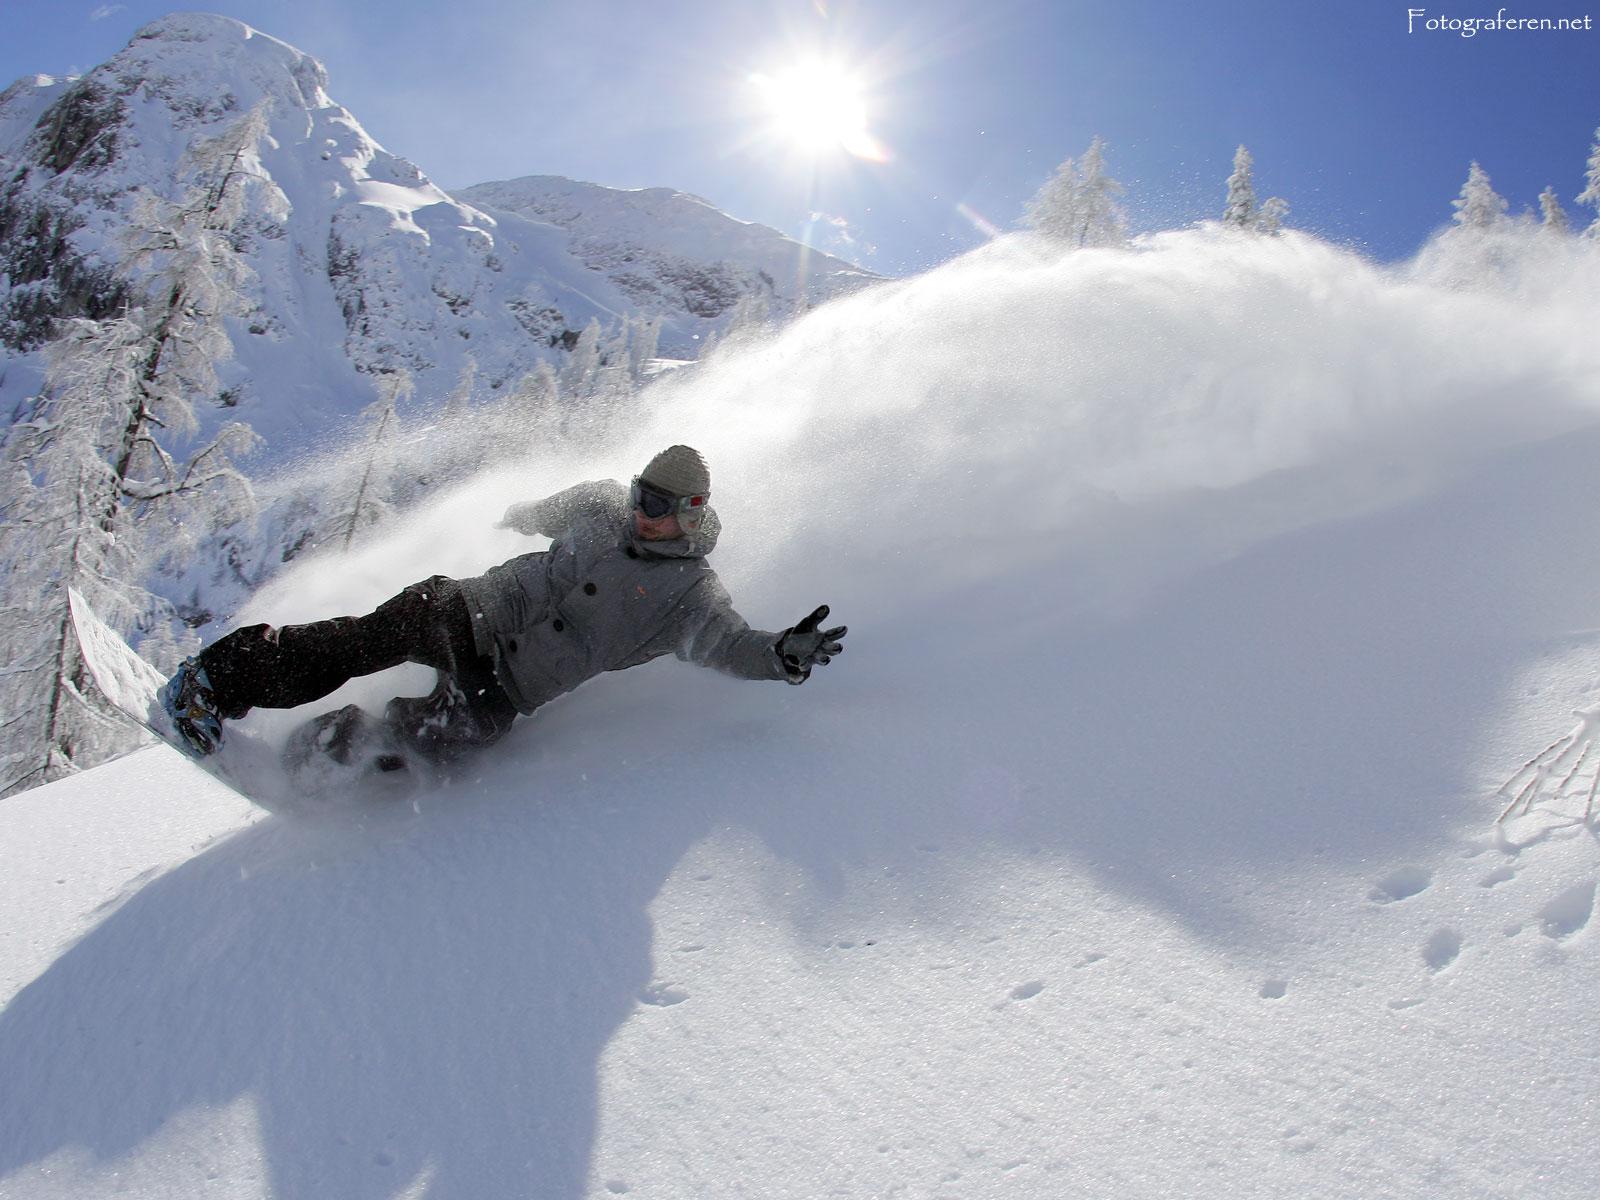 Snowboarding pow